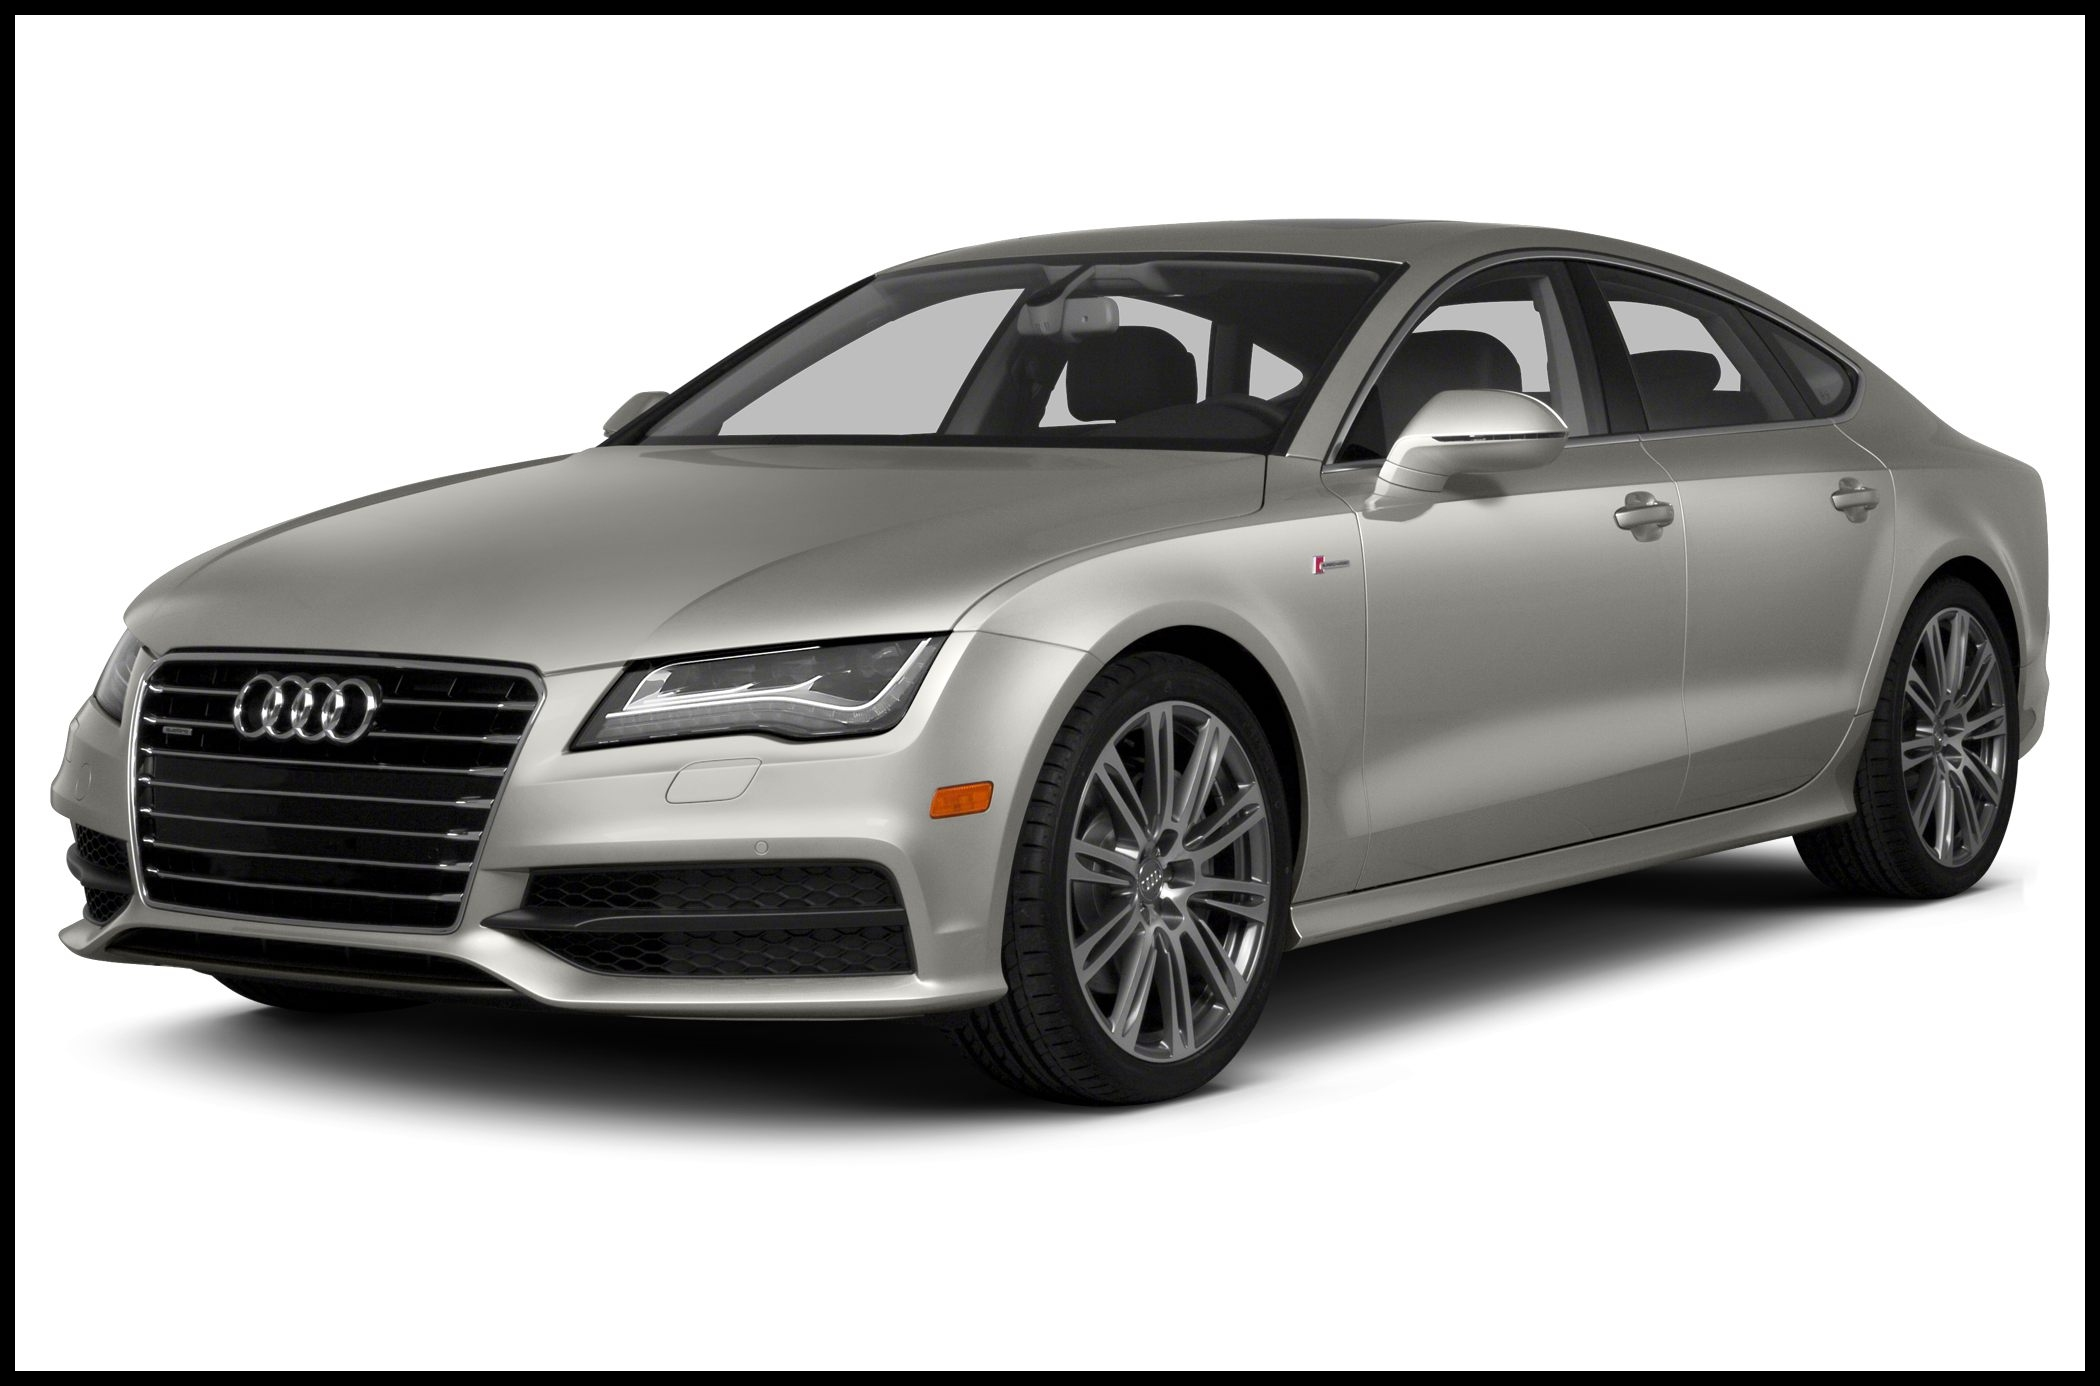 2013 Audi A7 Prestige Vs Premium Plus >> 2013 Audi A7 Prestige Vs Premium Plus The Best Choice Car